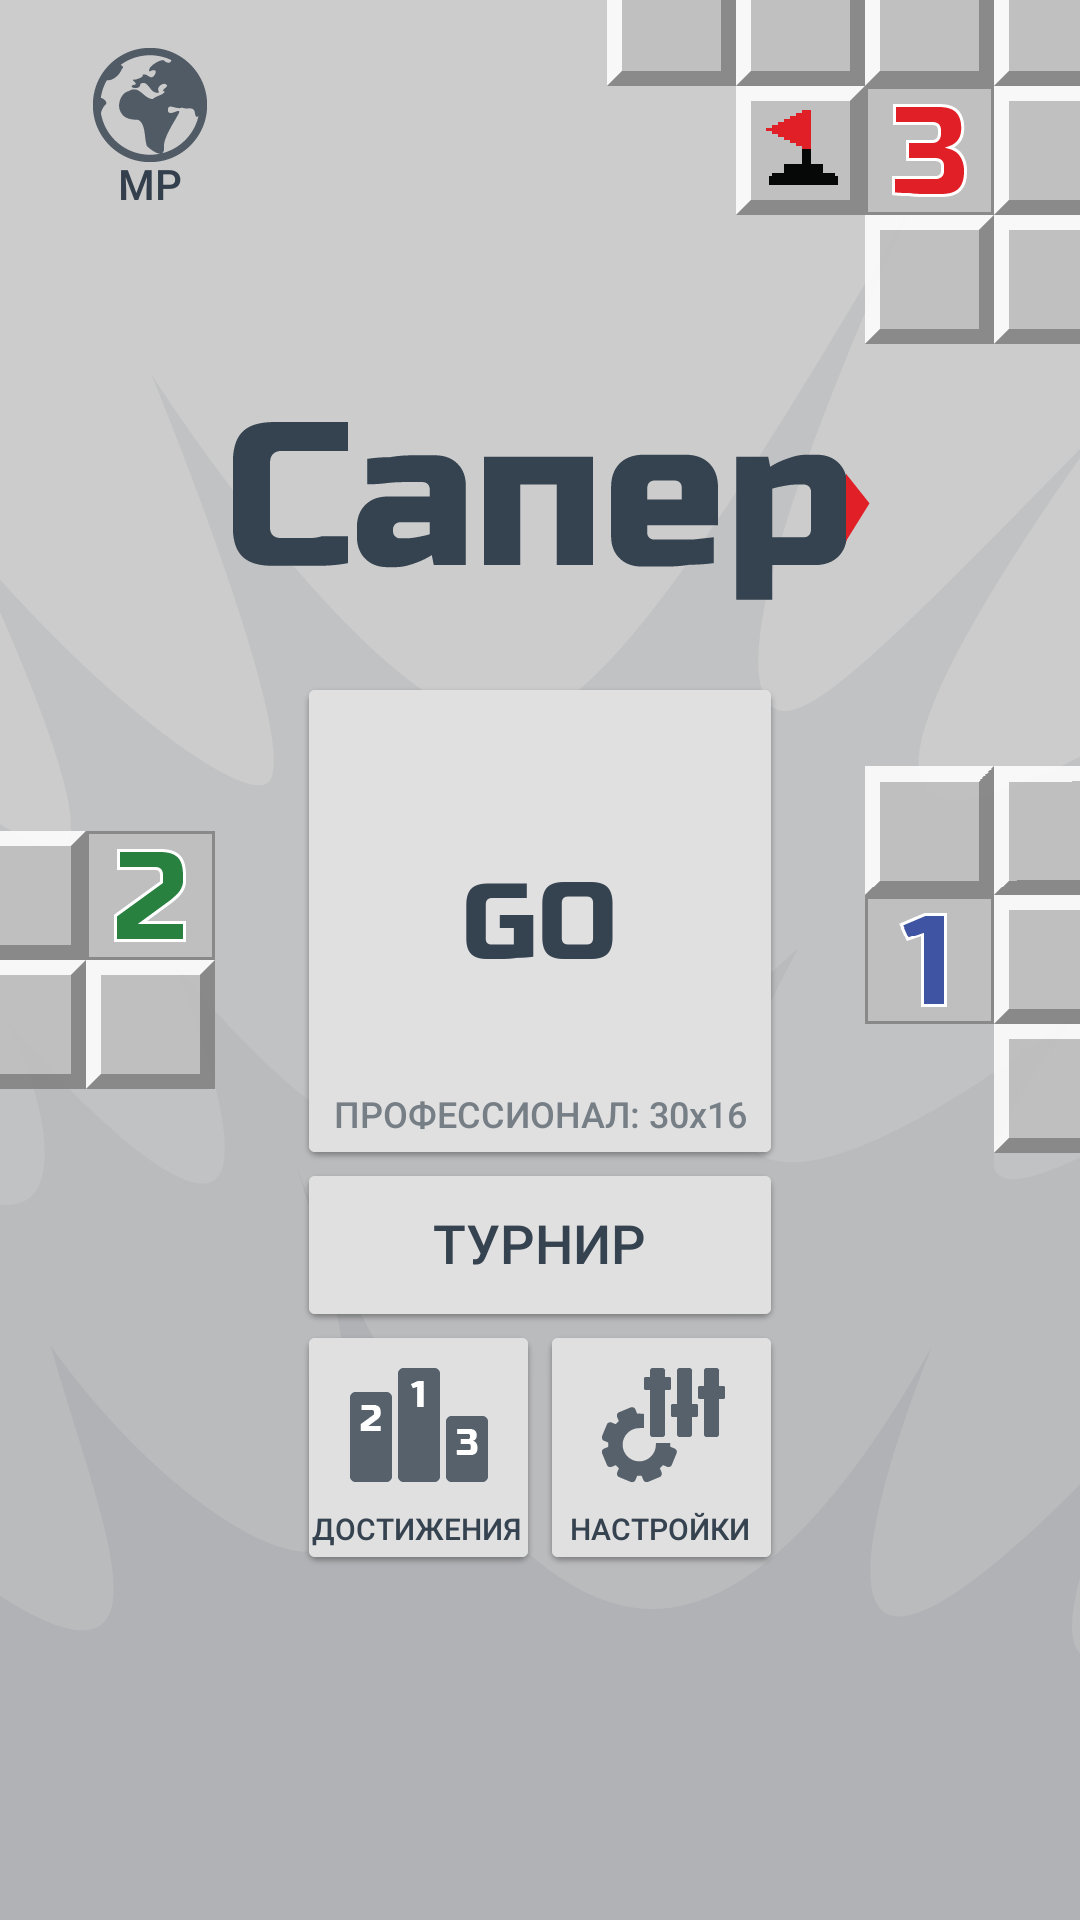 Main scene | Android: Сапер Go для продвинутых игроков